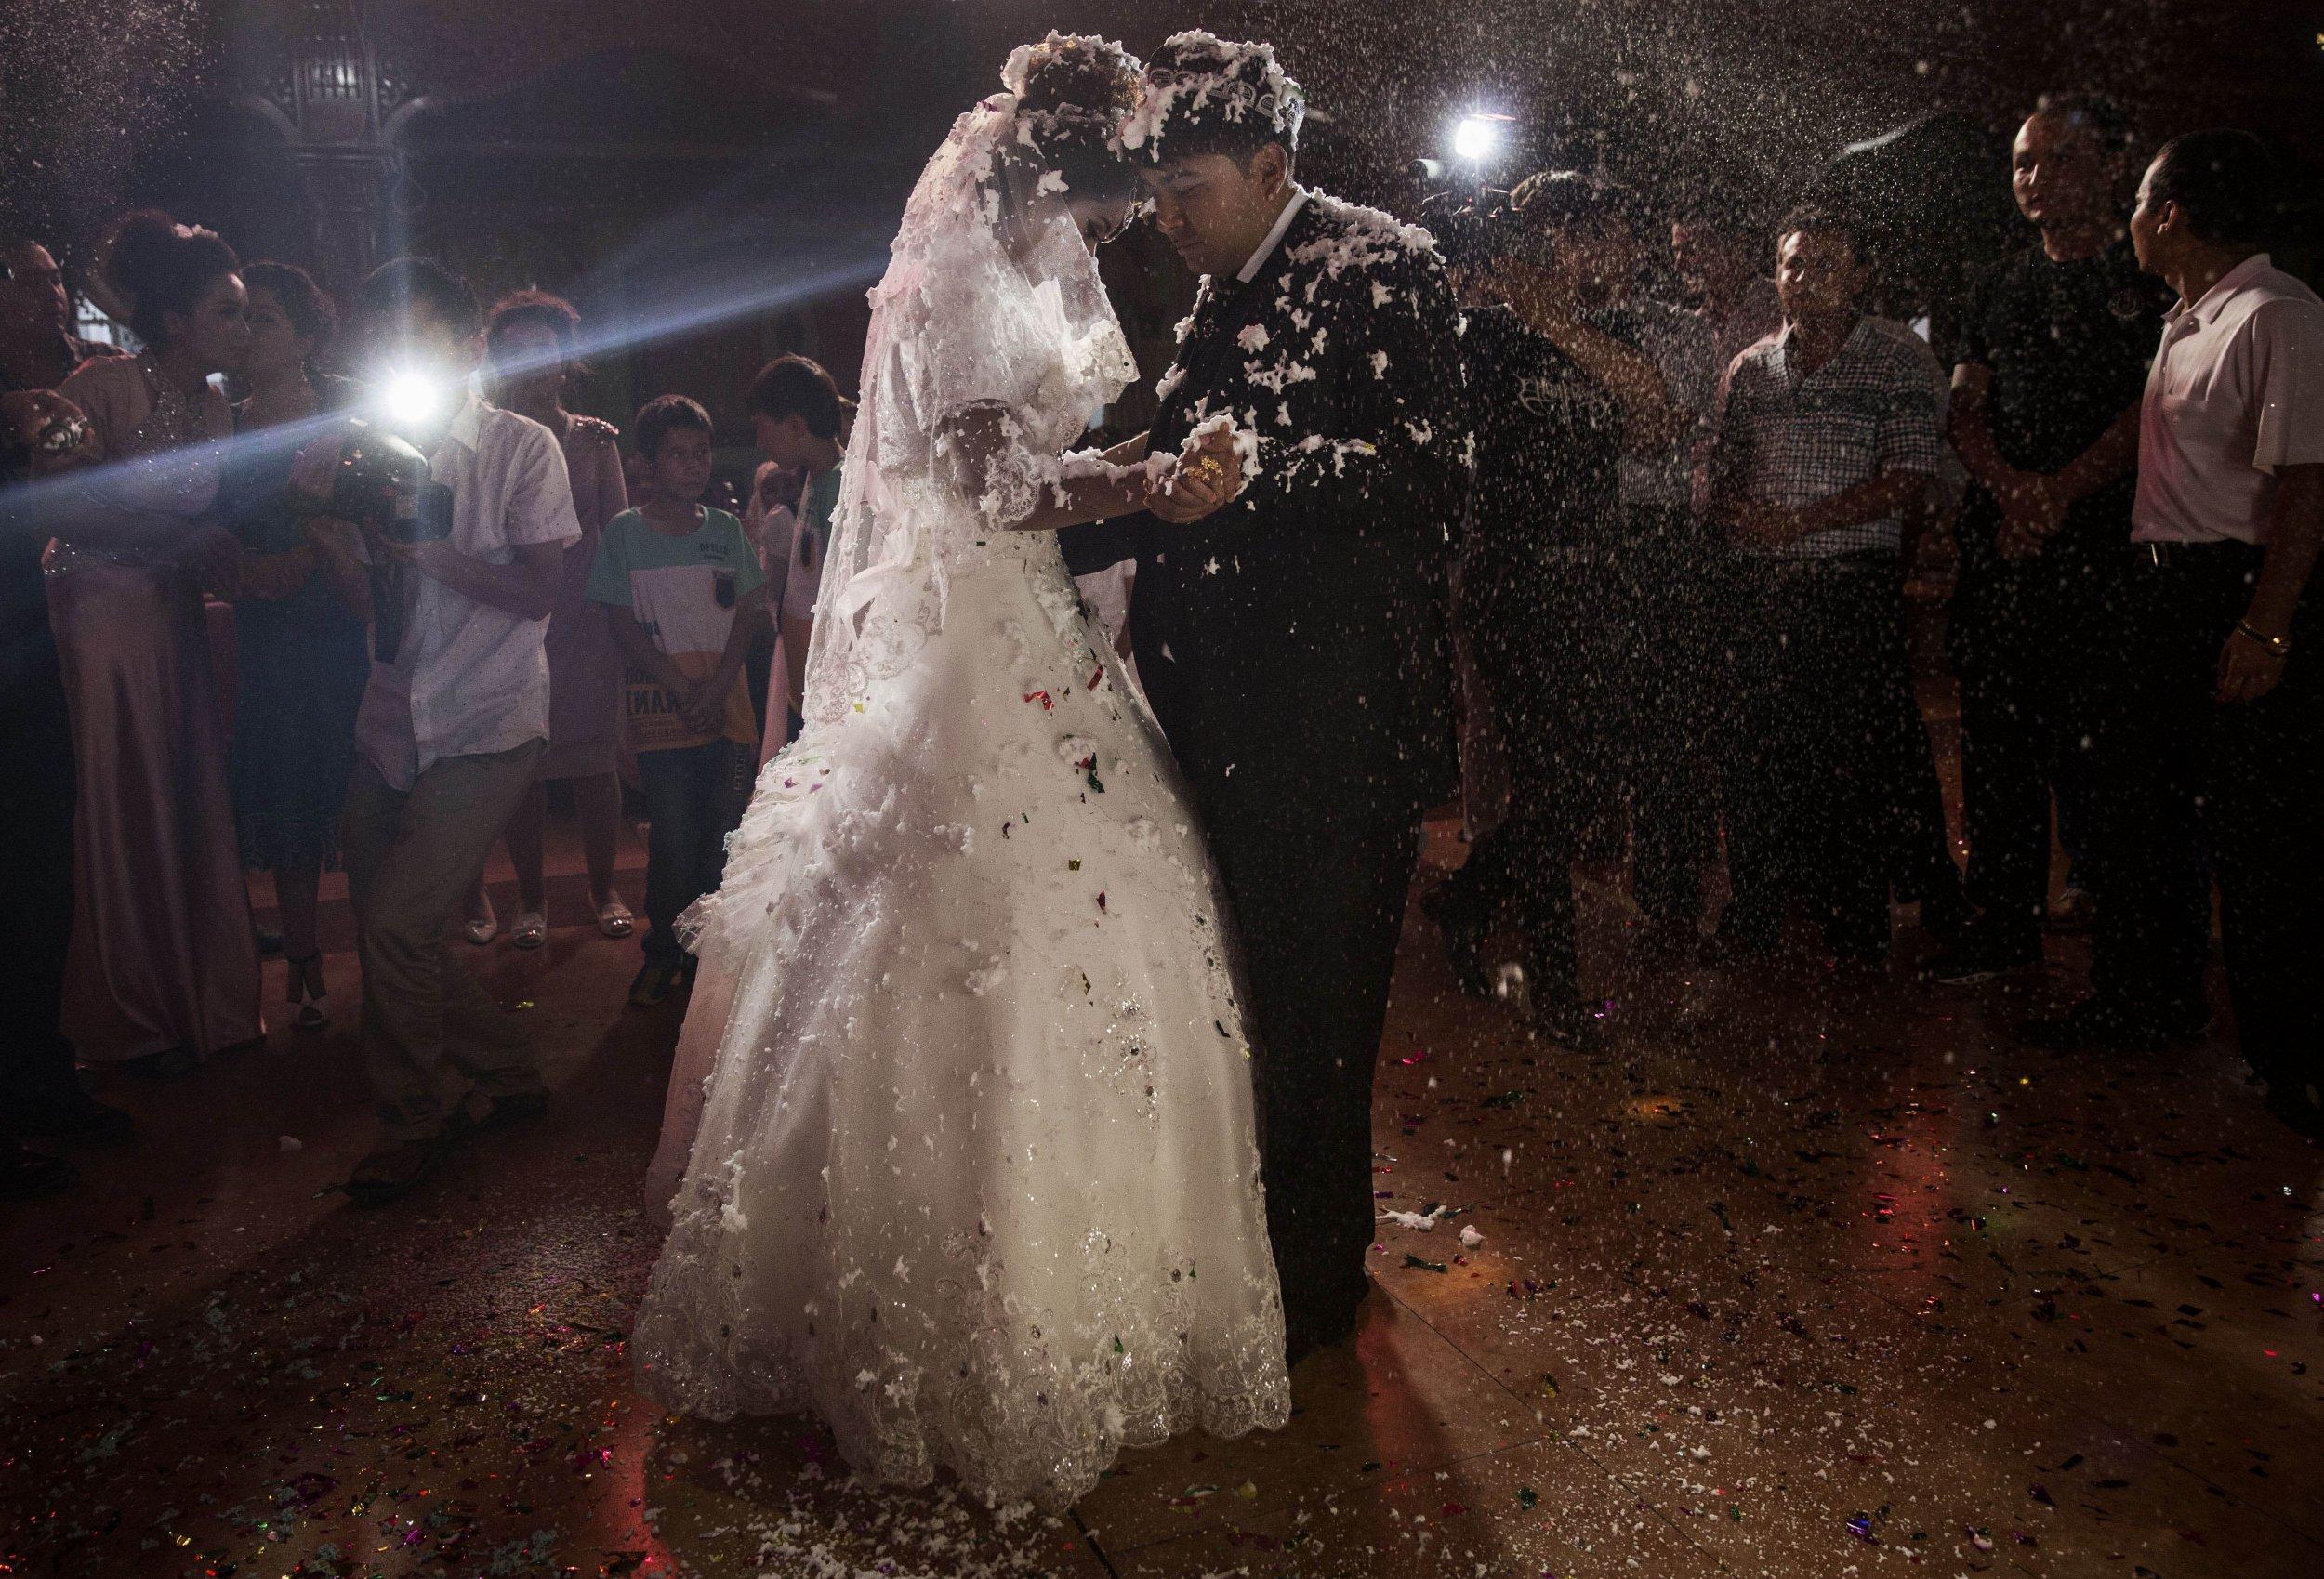 Popular Wedding Songs.The 10 Most Popular Wedding Songs Revealed